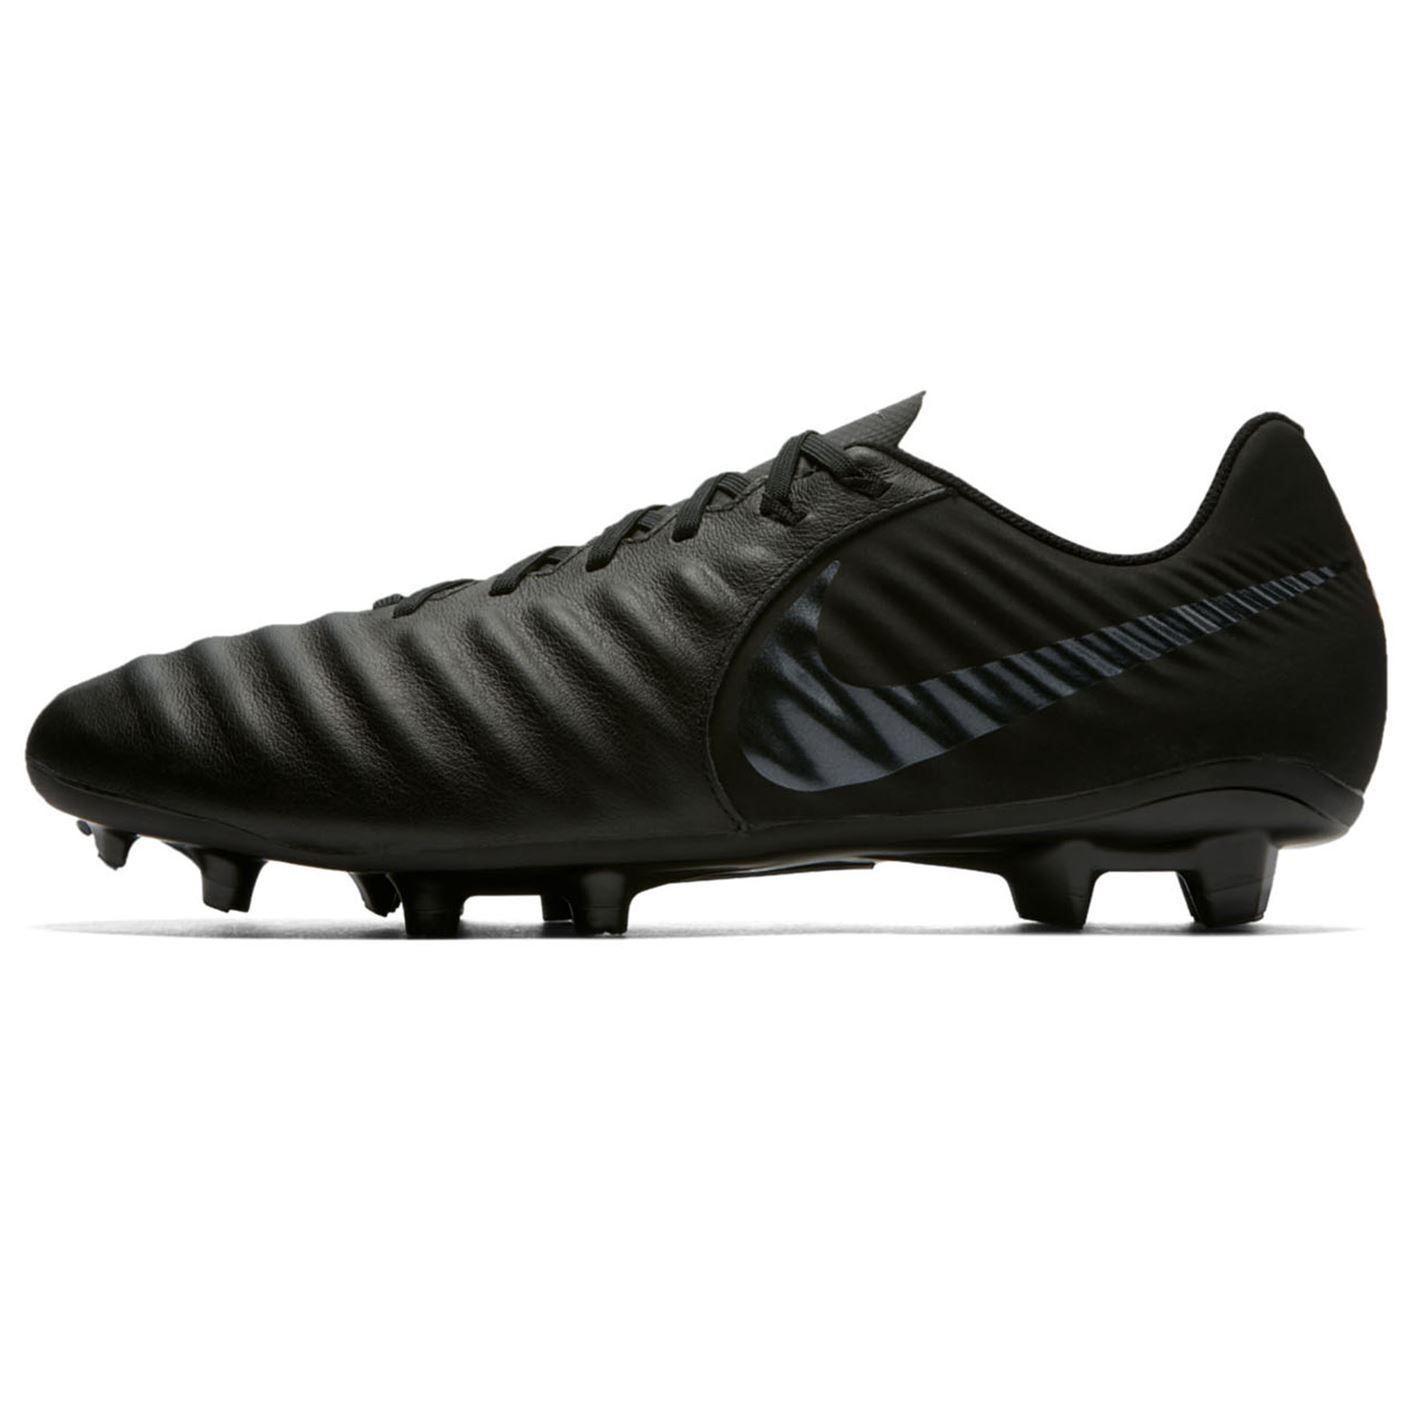 Nike-Tiempo-Legend-Academy-FG-Firm-Ground-Chaussures-De-Football-Homme-Football-Chaussures-Crampons miniature 9